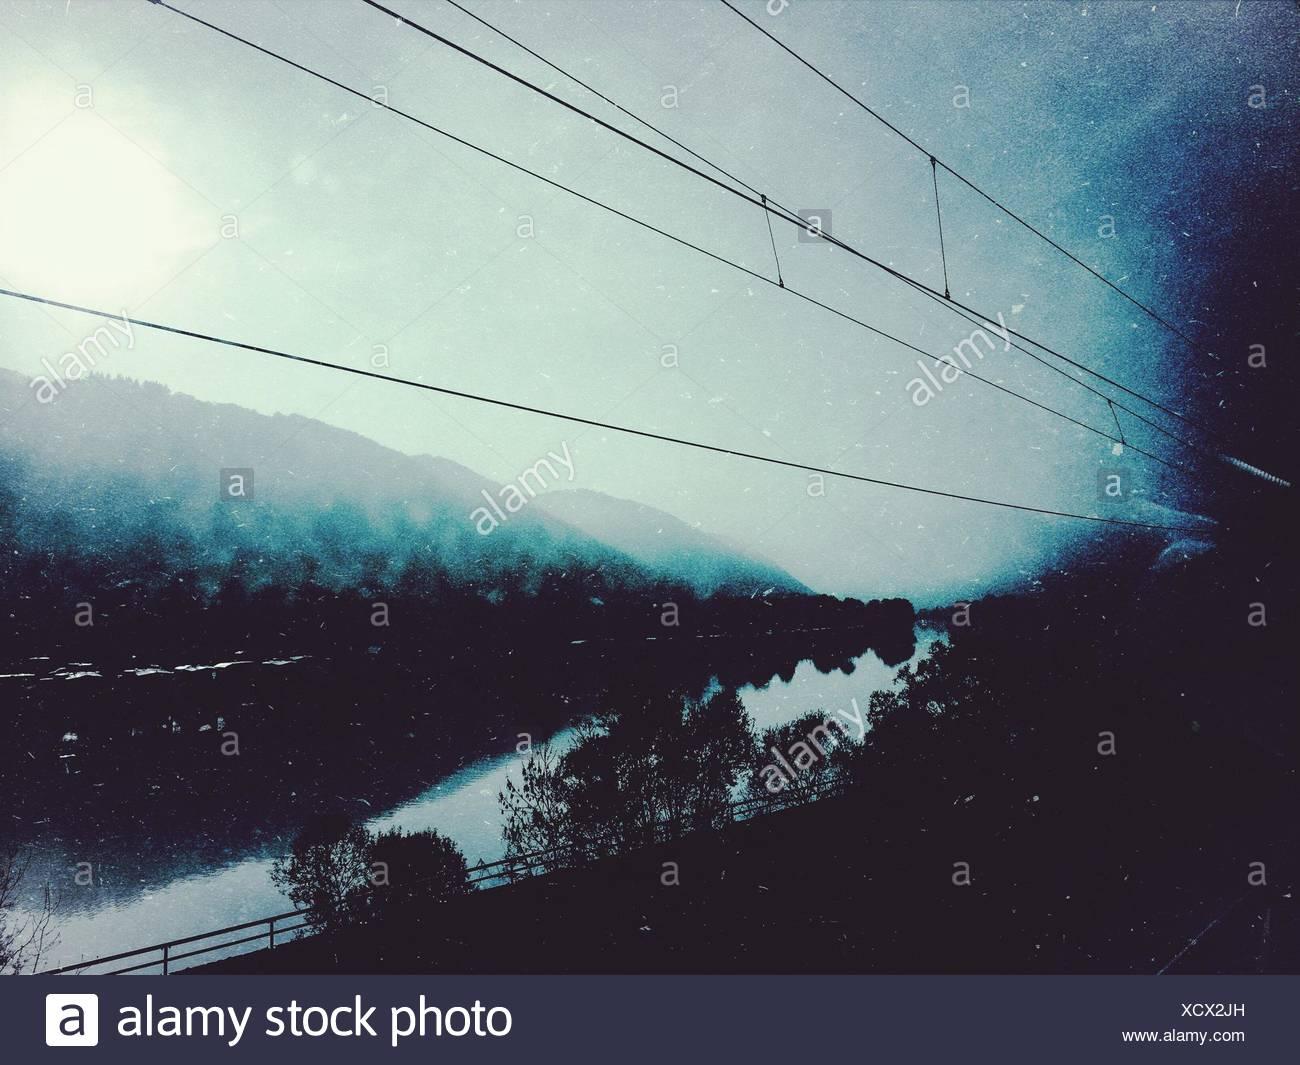 Power Line Along River - Stock Image